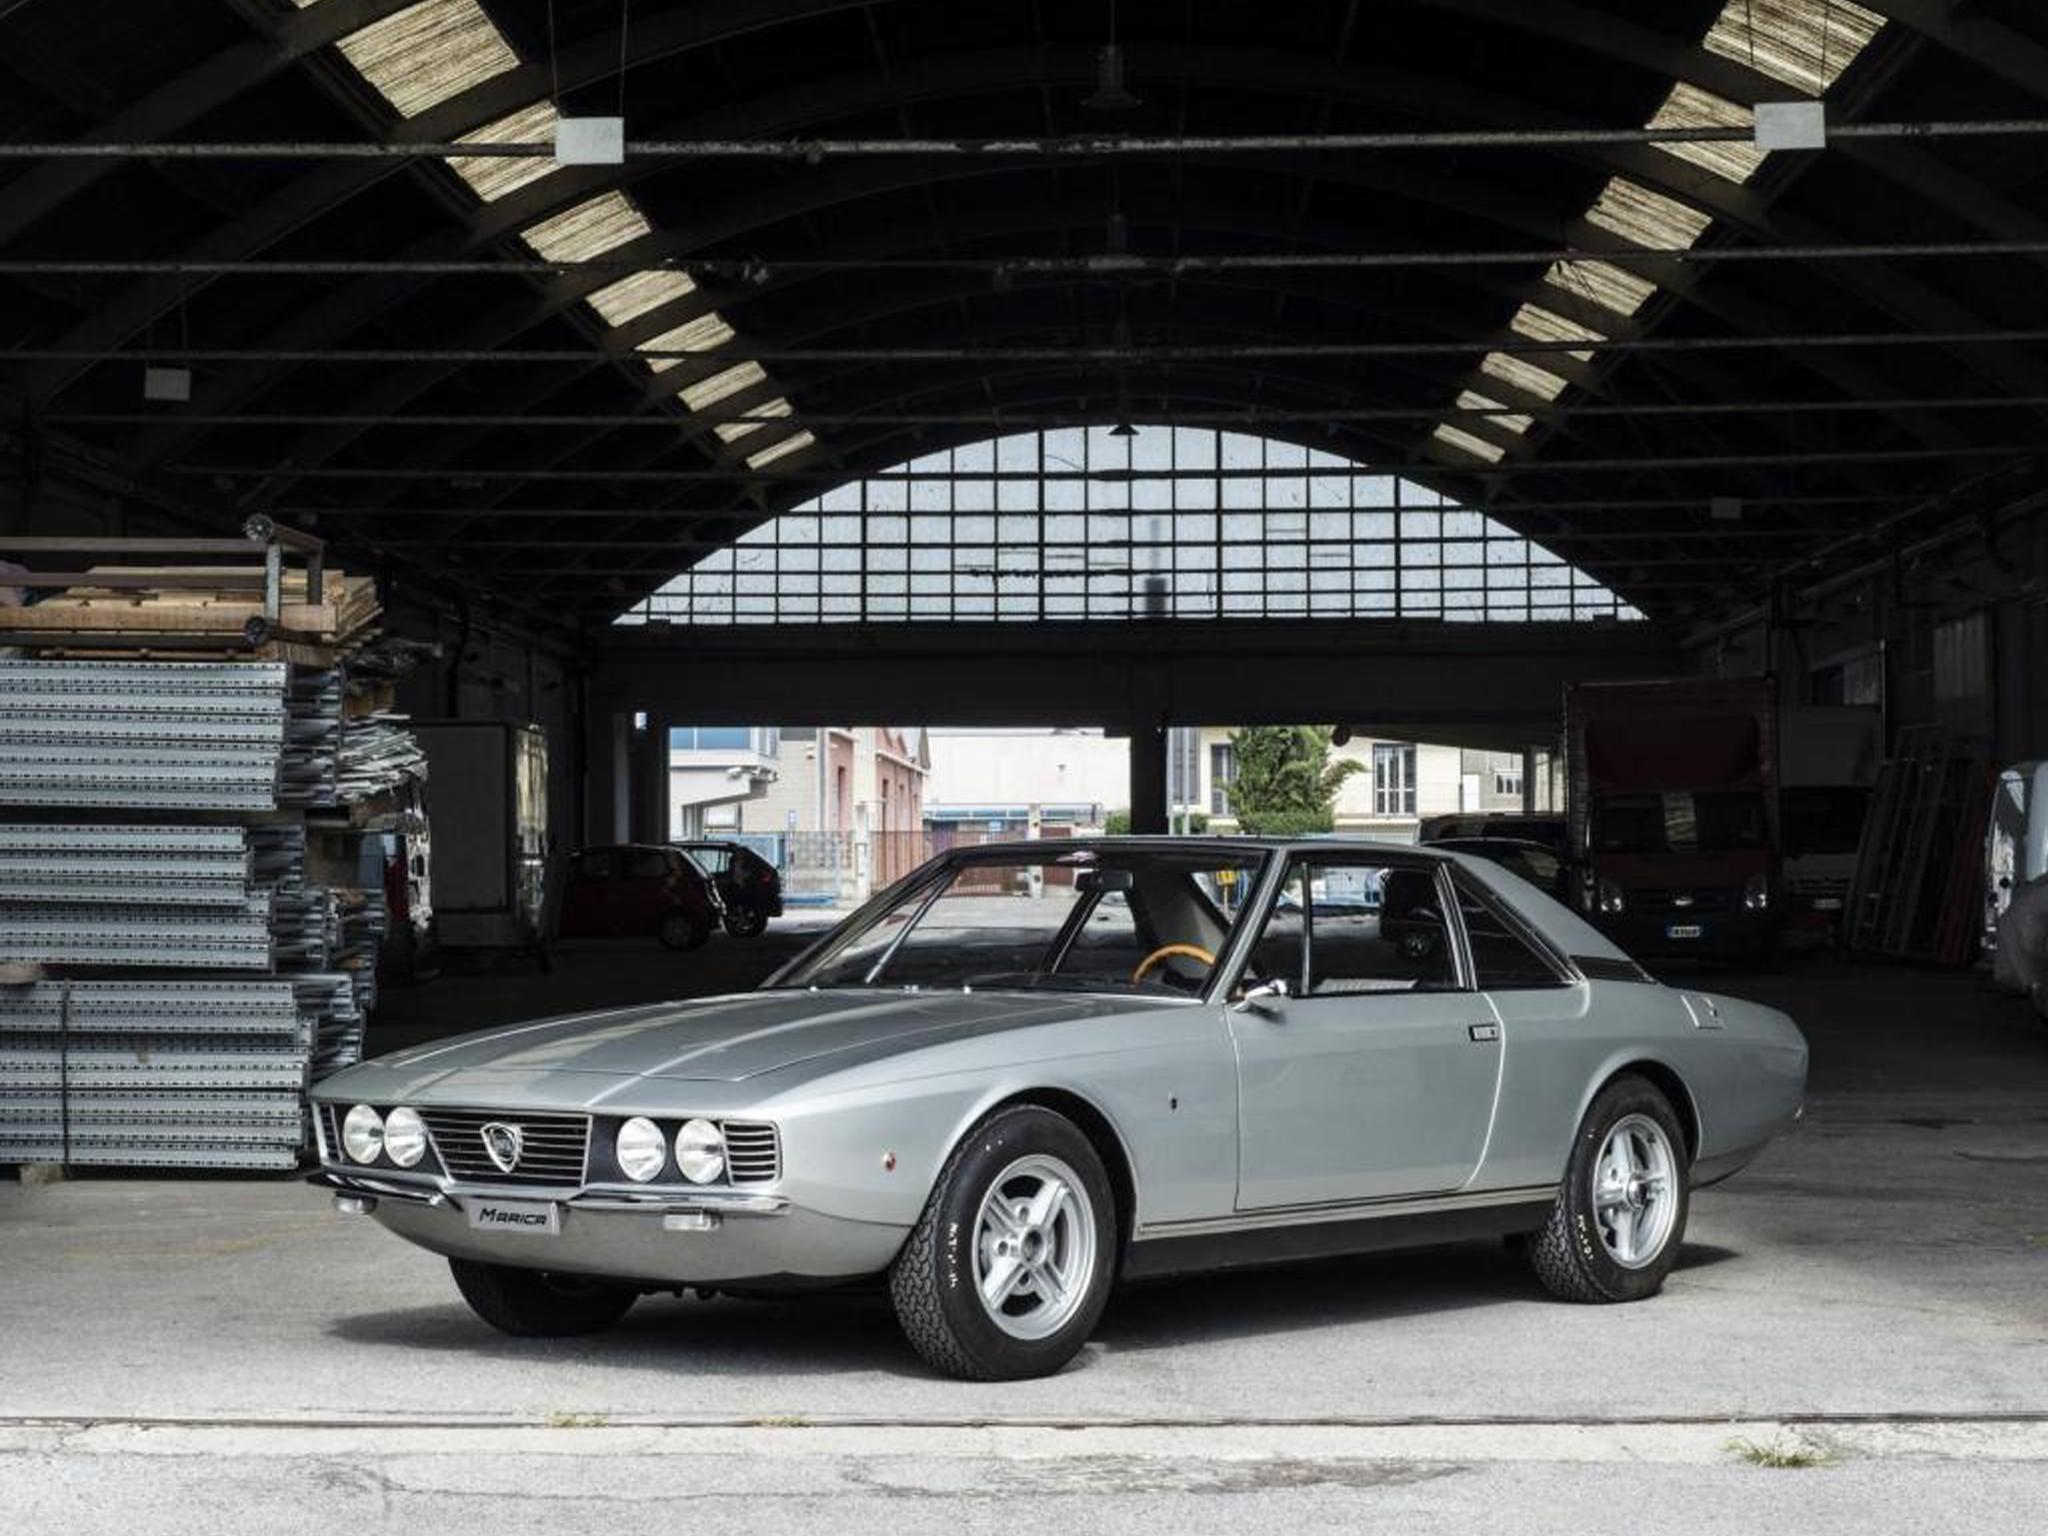 Lancia Flaminia Marica Ghia produced in 1969